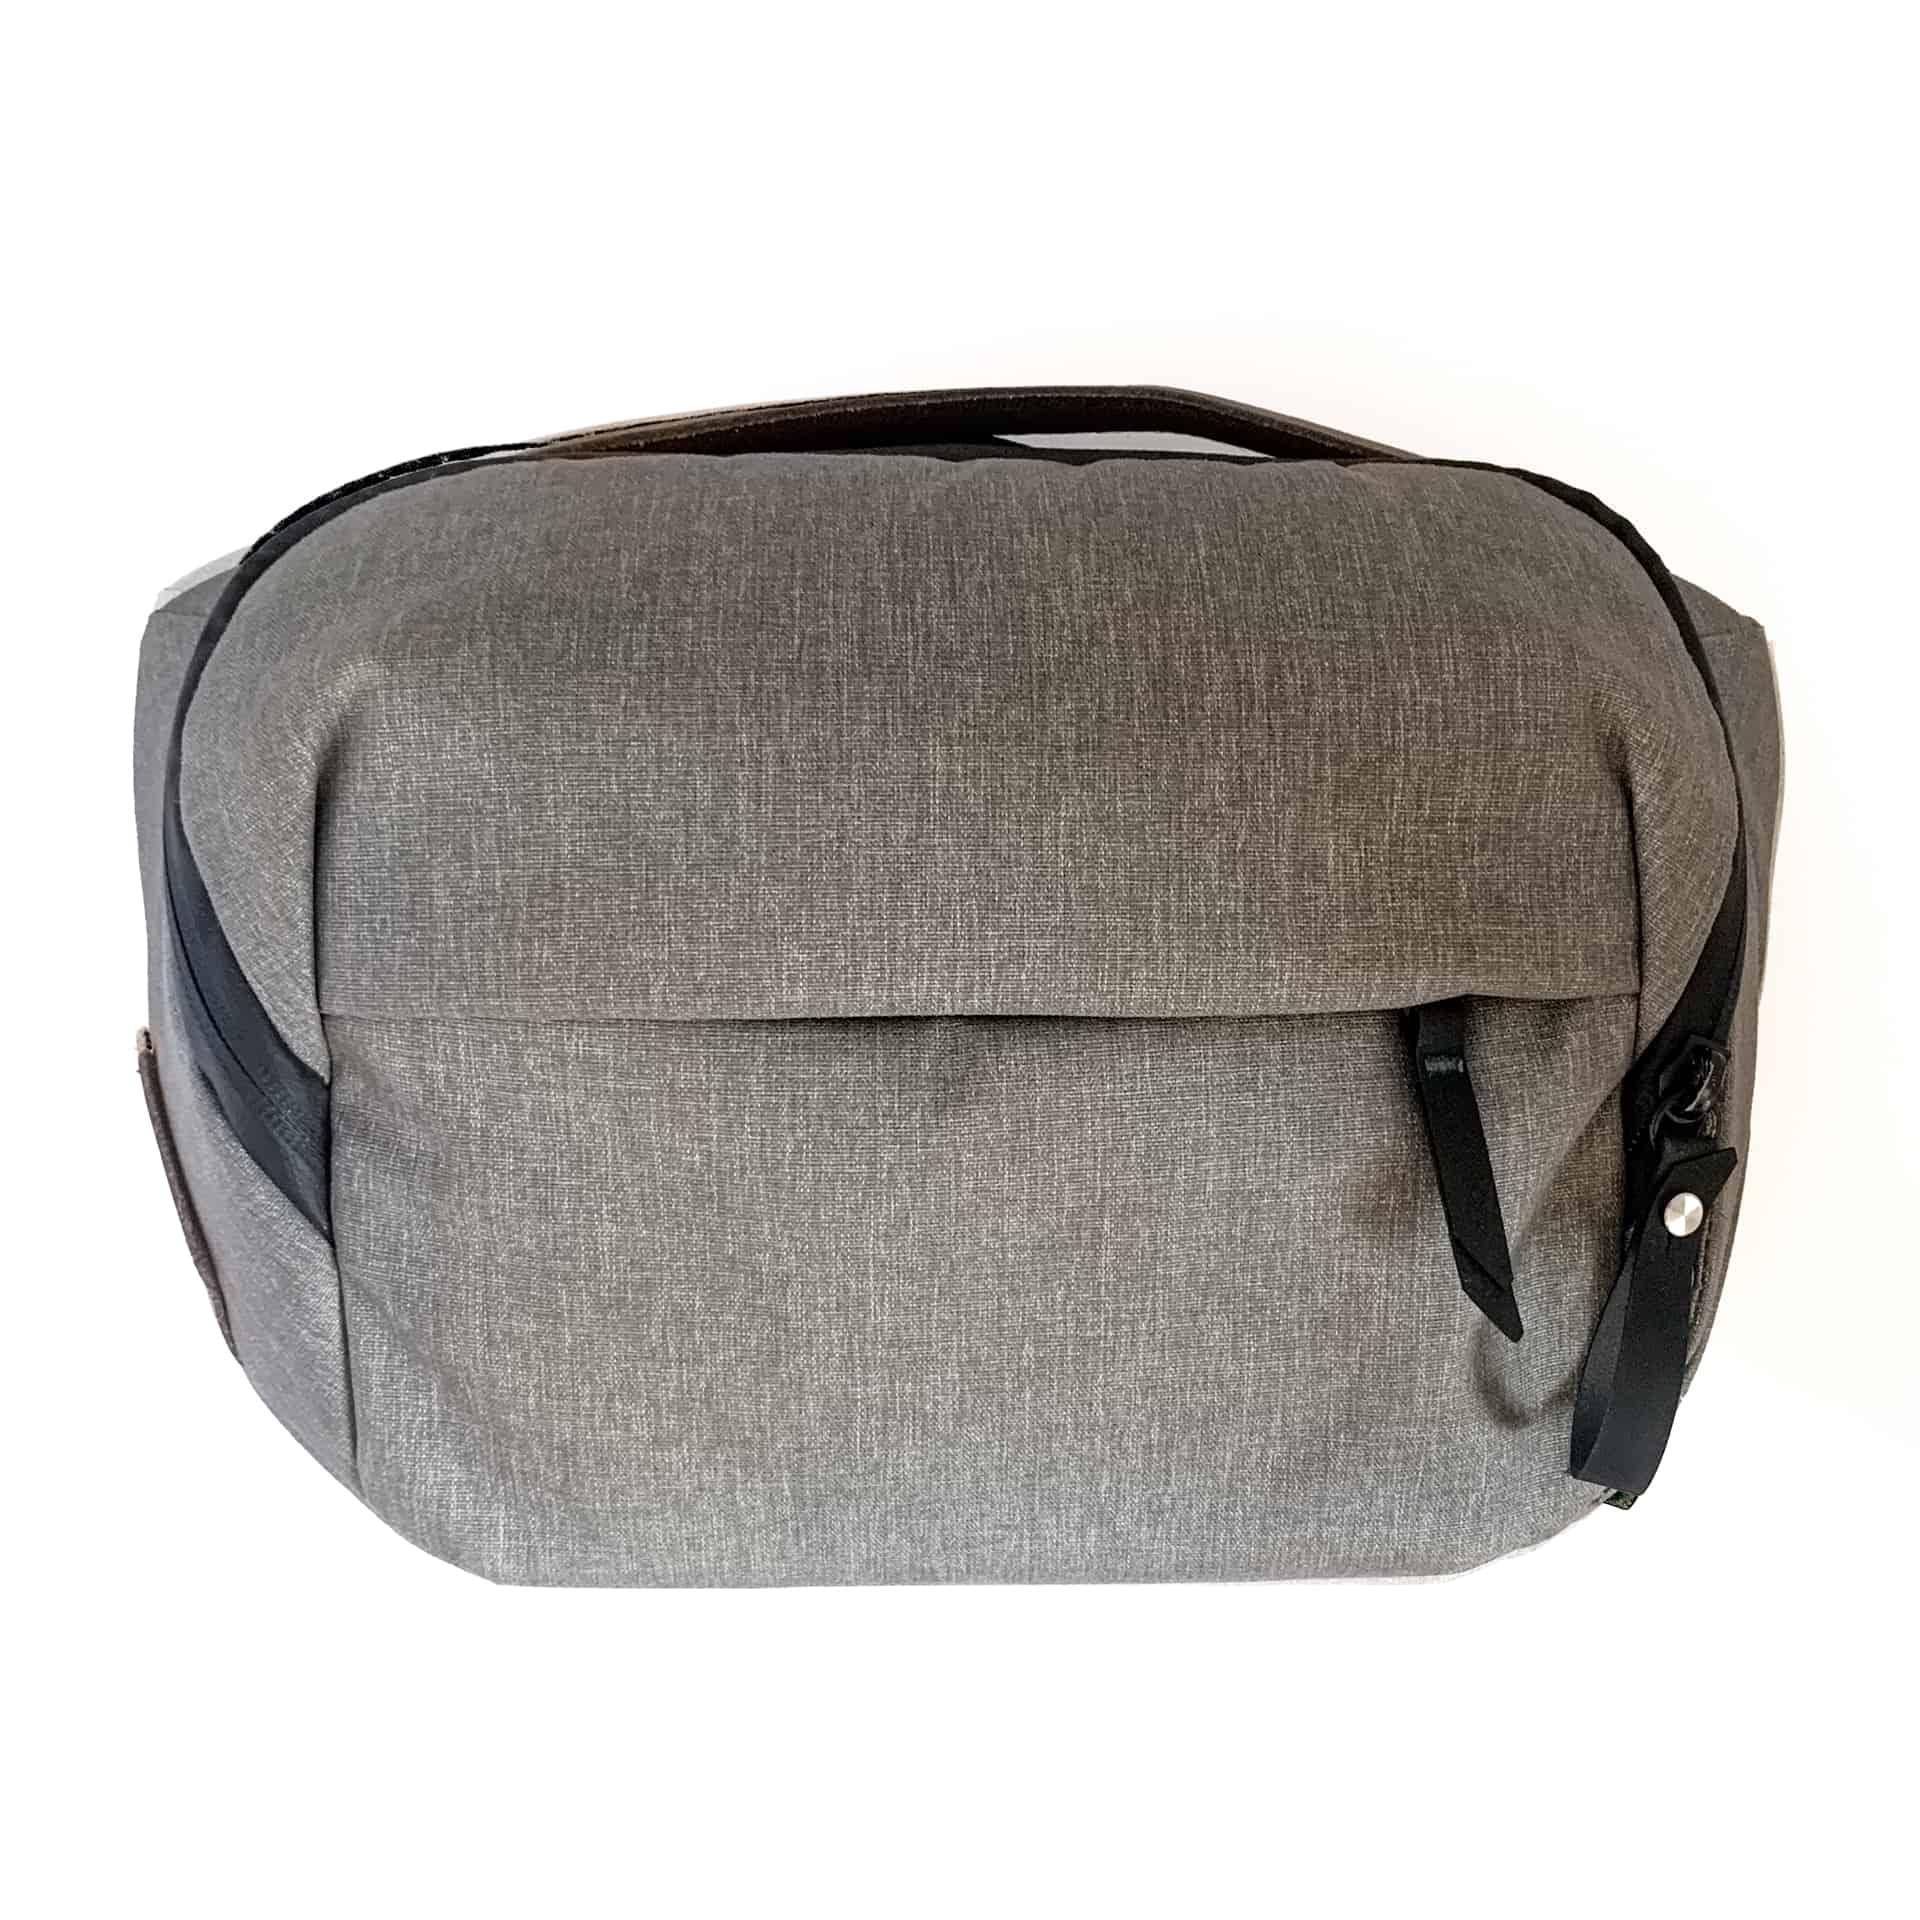 Peak Everyday Bag